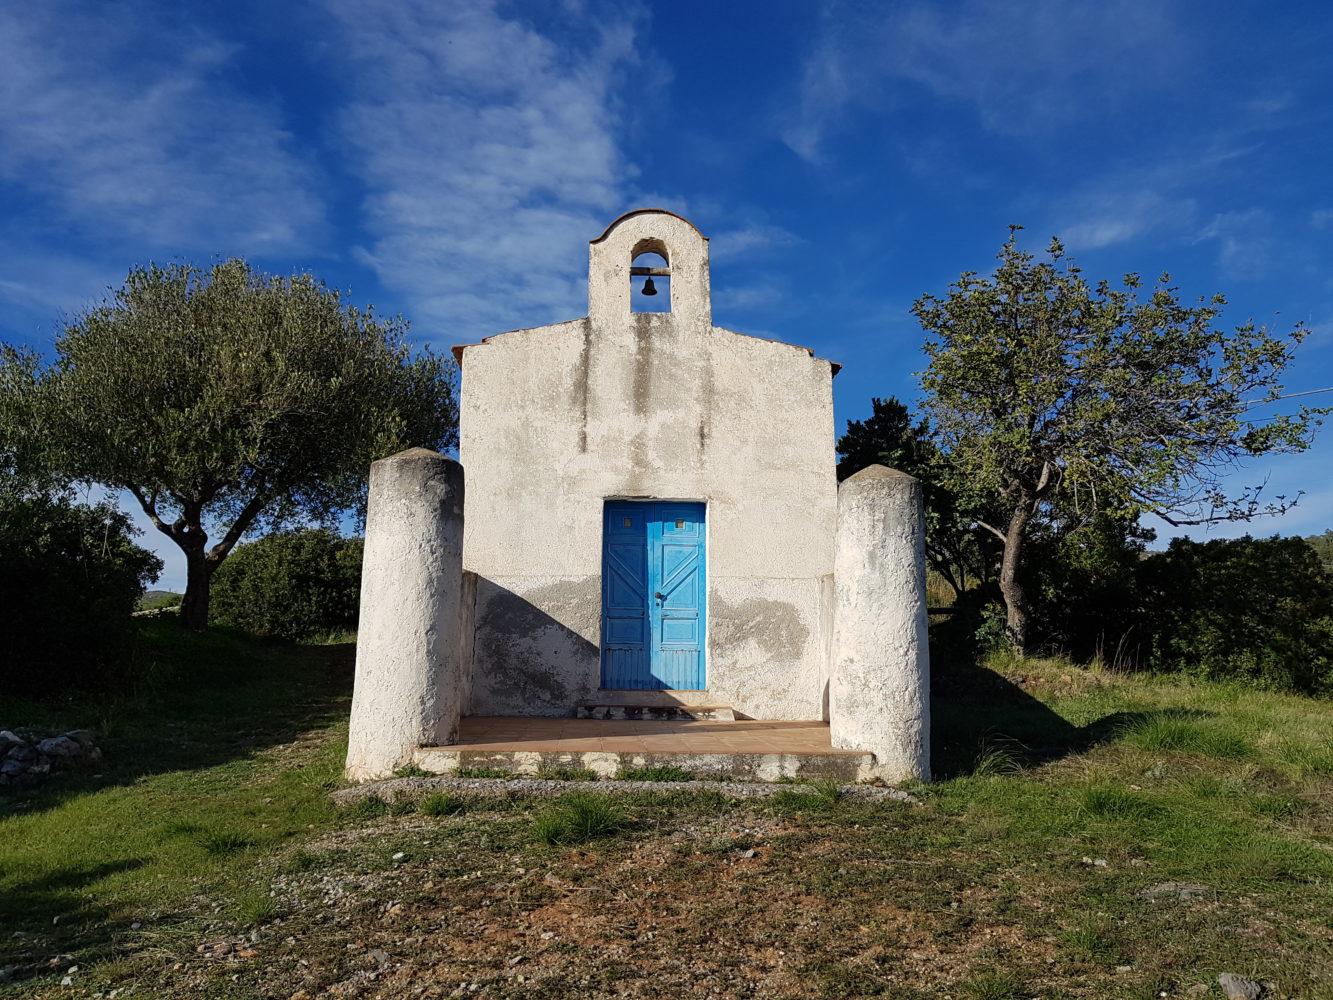 Cappella di Piedigrotta Lentiscosa